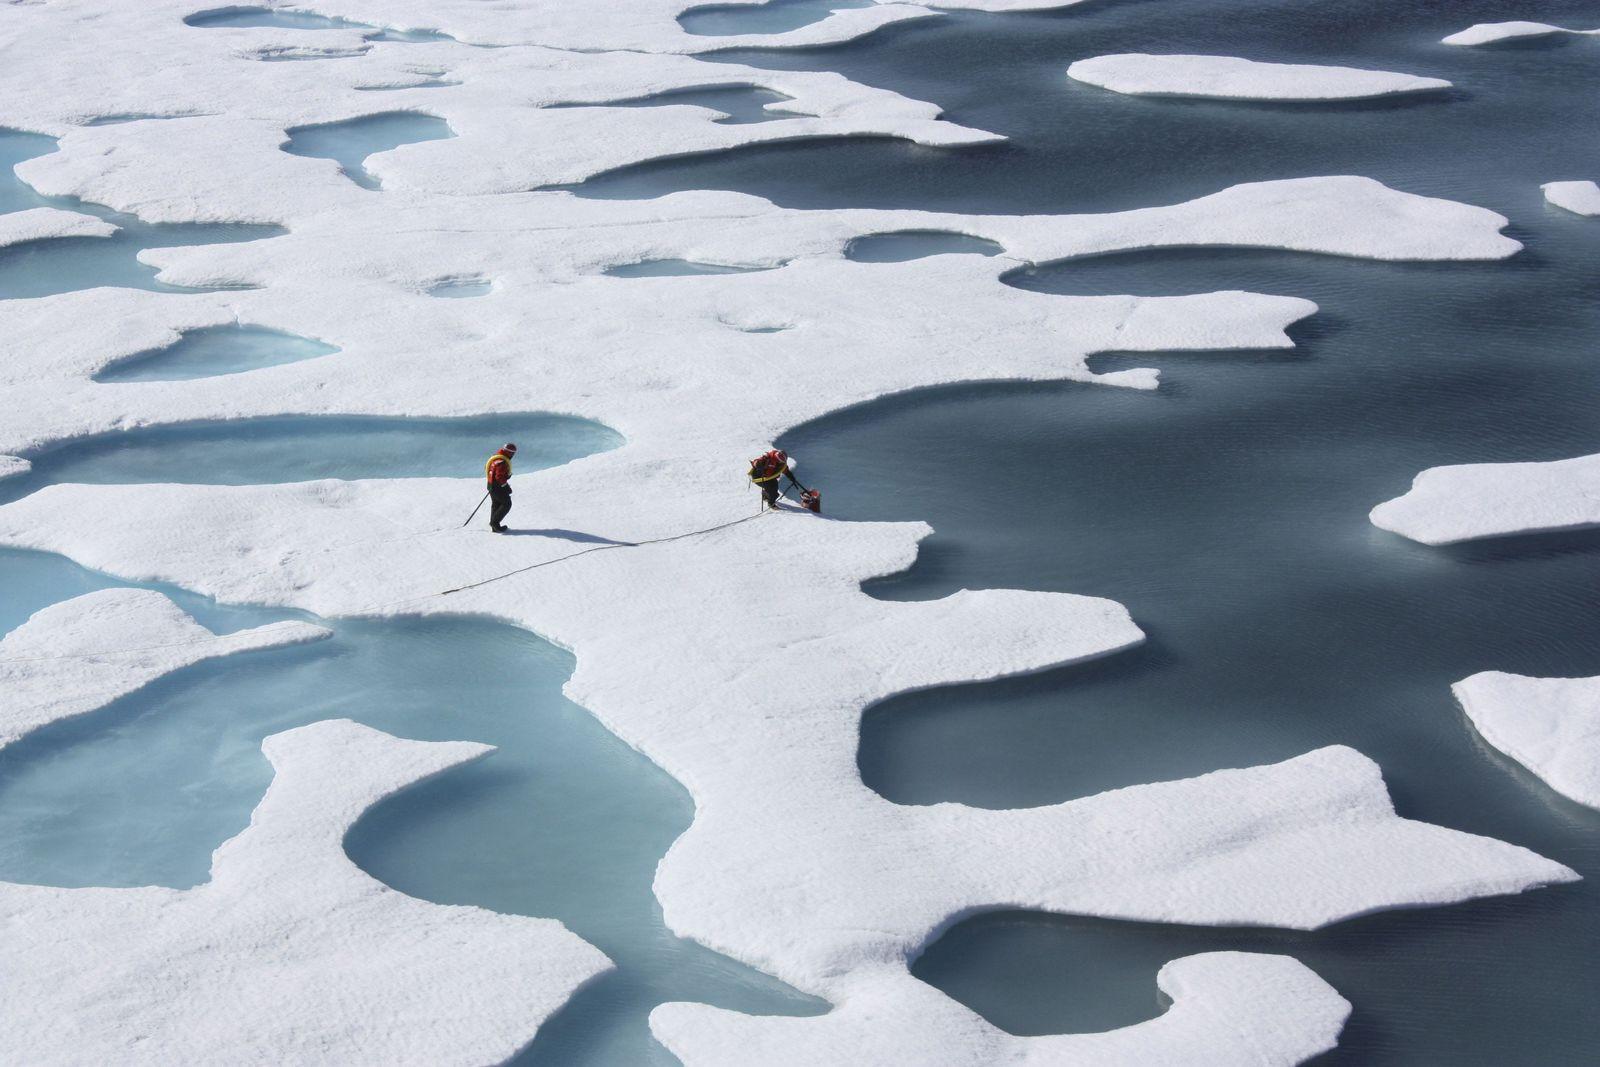 Arktis / Ozean